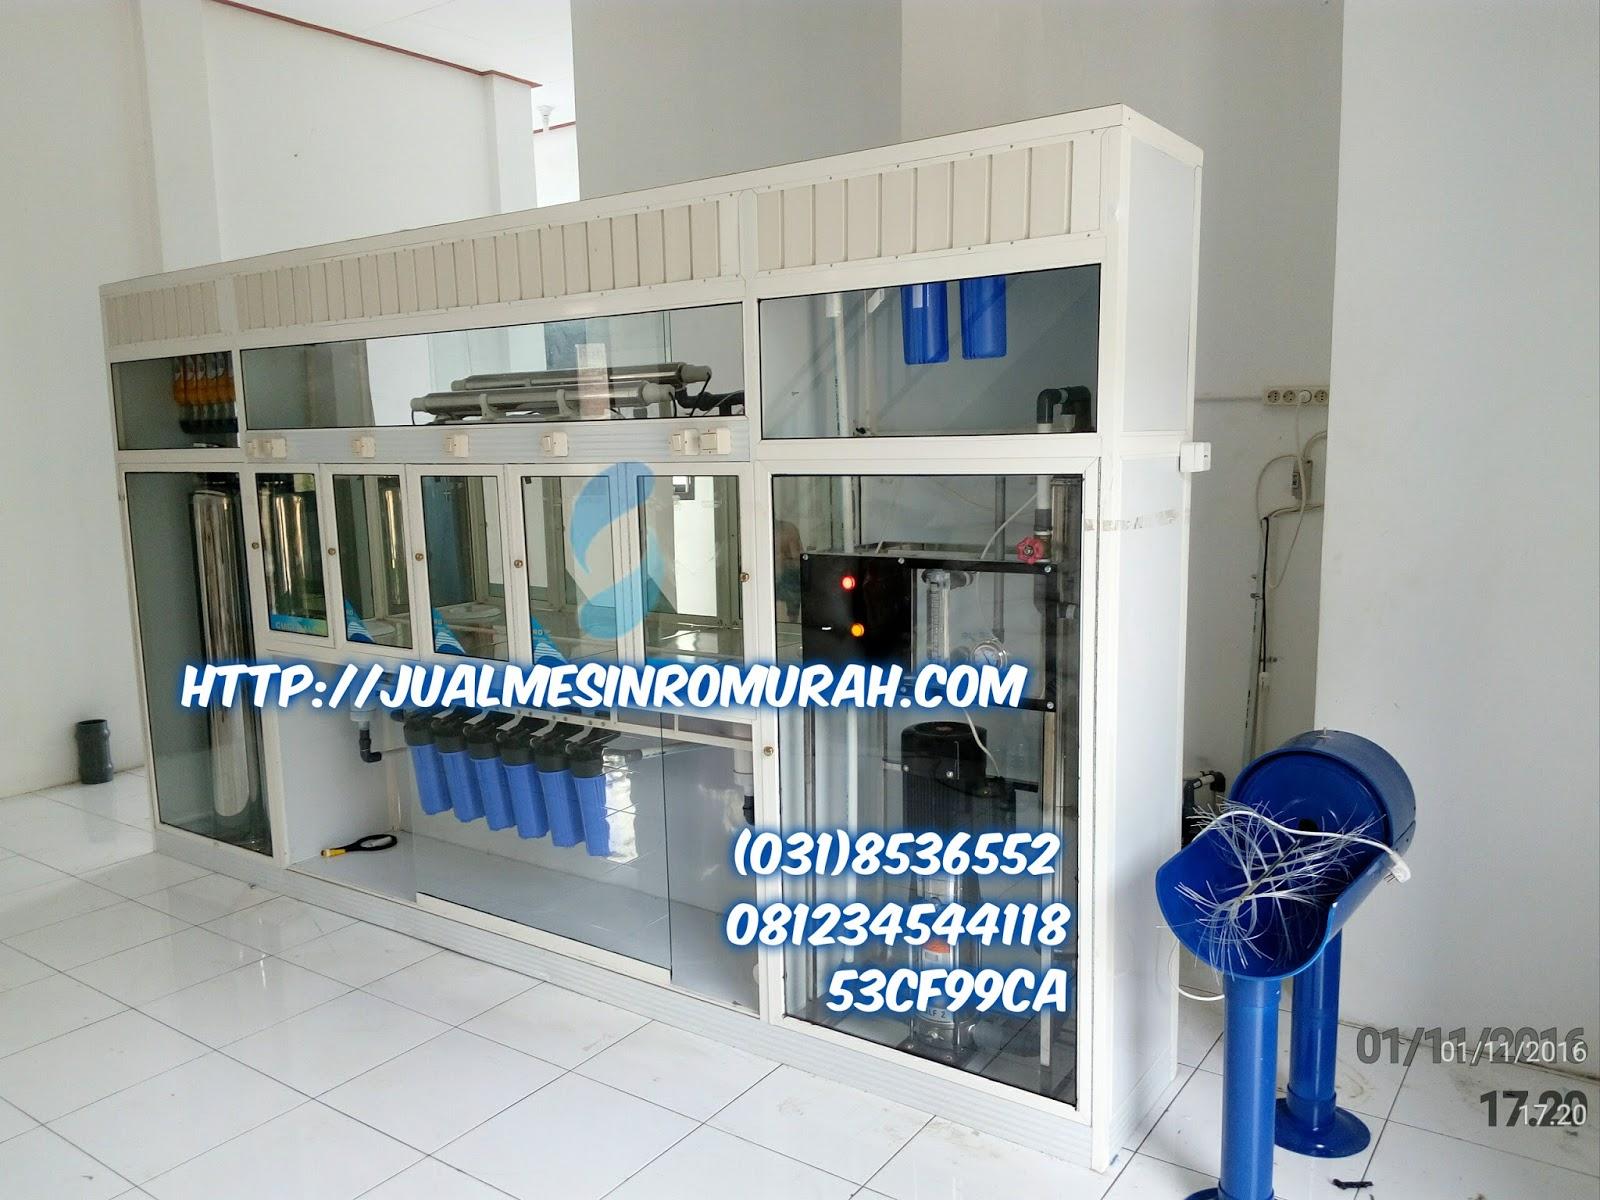 Depo Air Minum Isi Ulang Mesin Reverse Osmosis Tissue Galon Paket Ro Alkalin Bio Energi Ozon Ro04 Rp 51000000